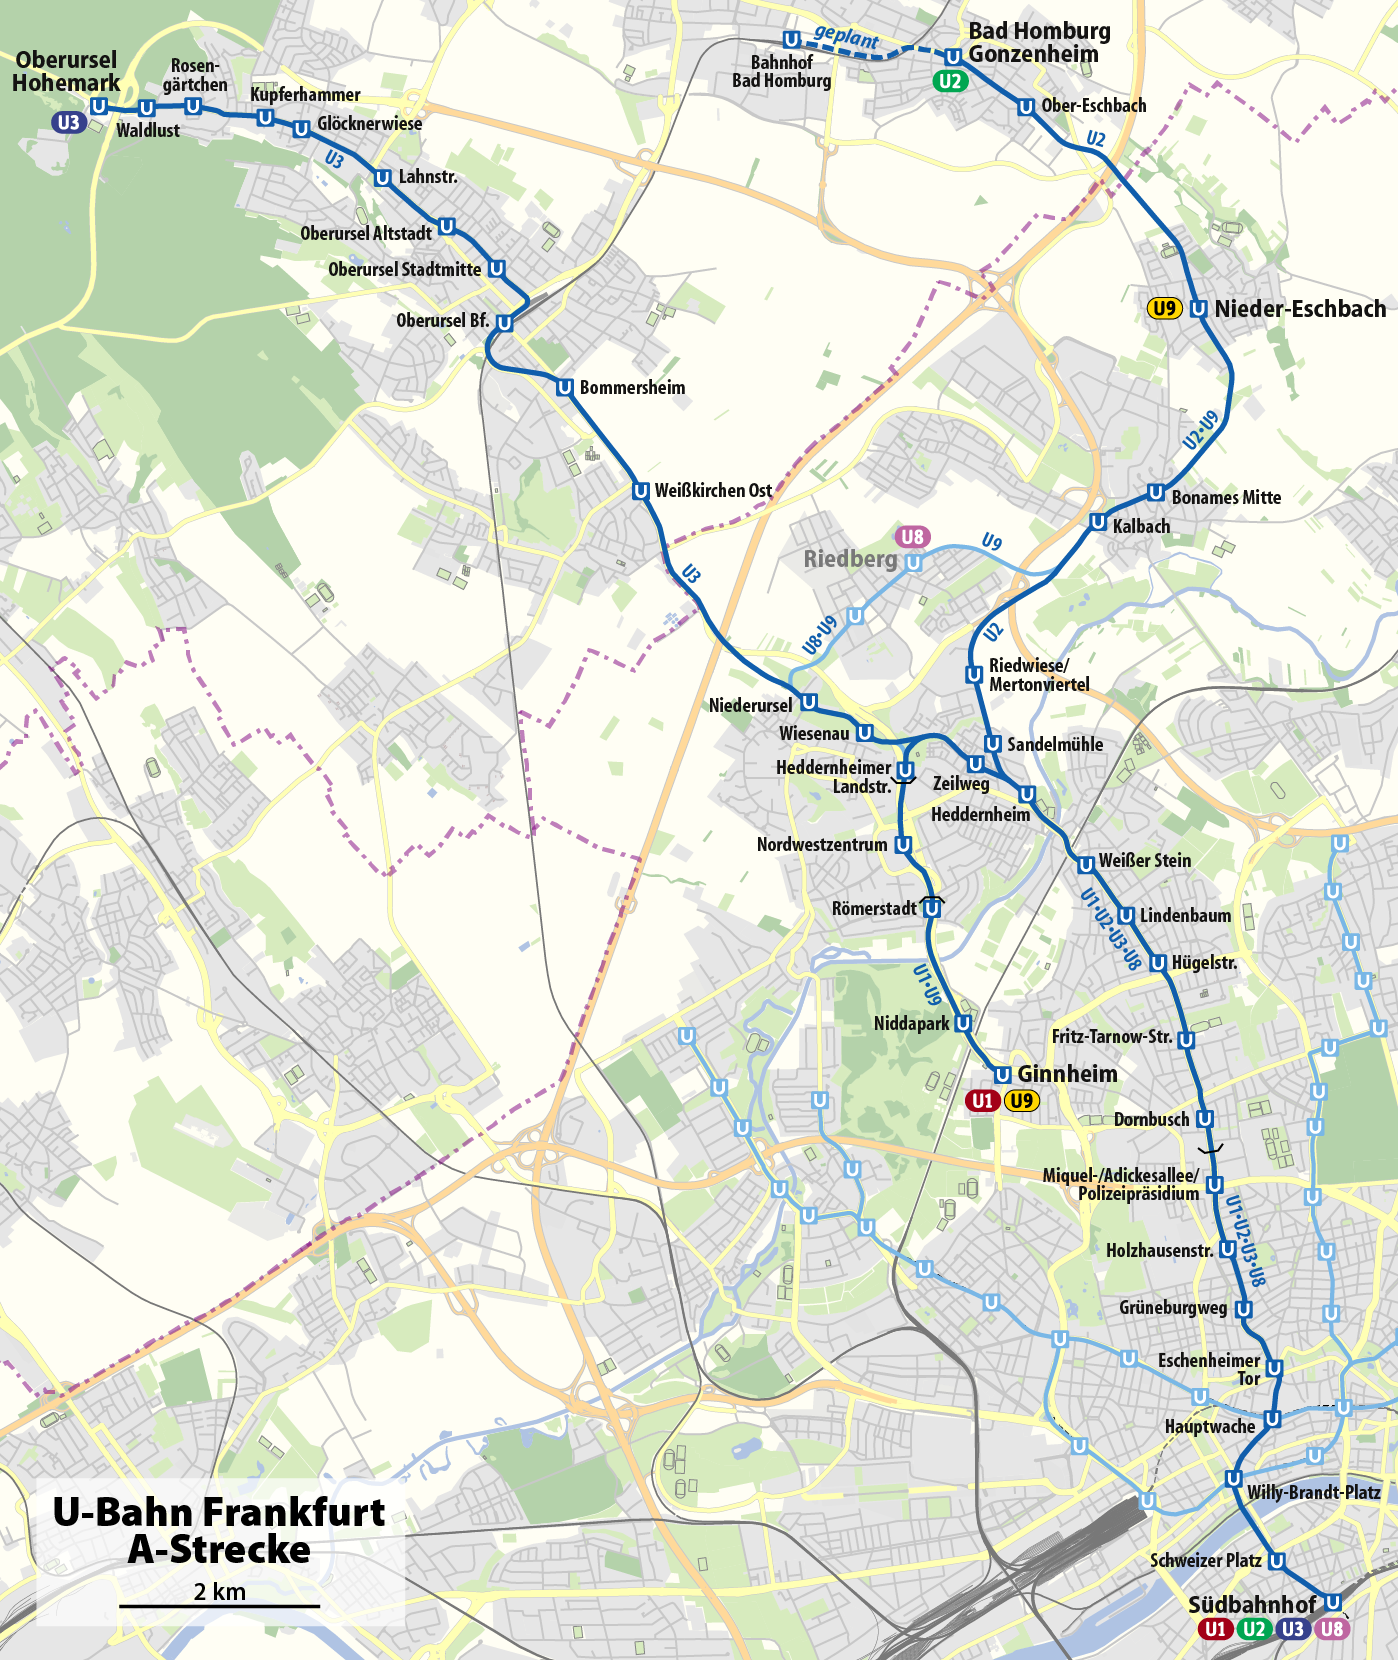 U-Bahn-Strecke A (Frankfurt Am Main)